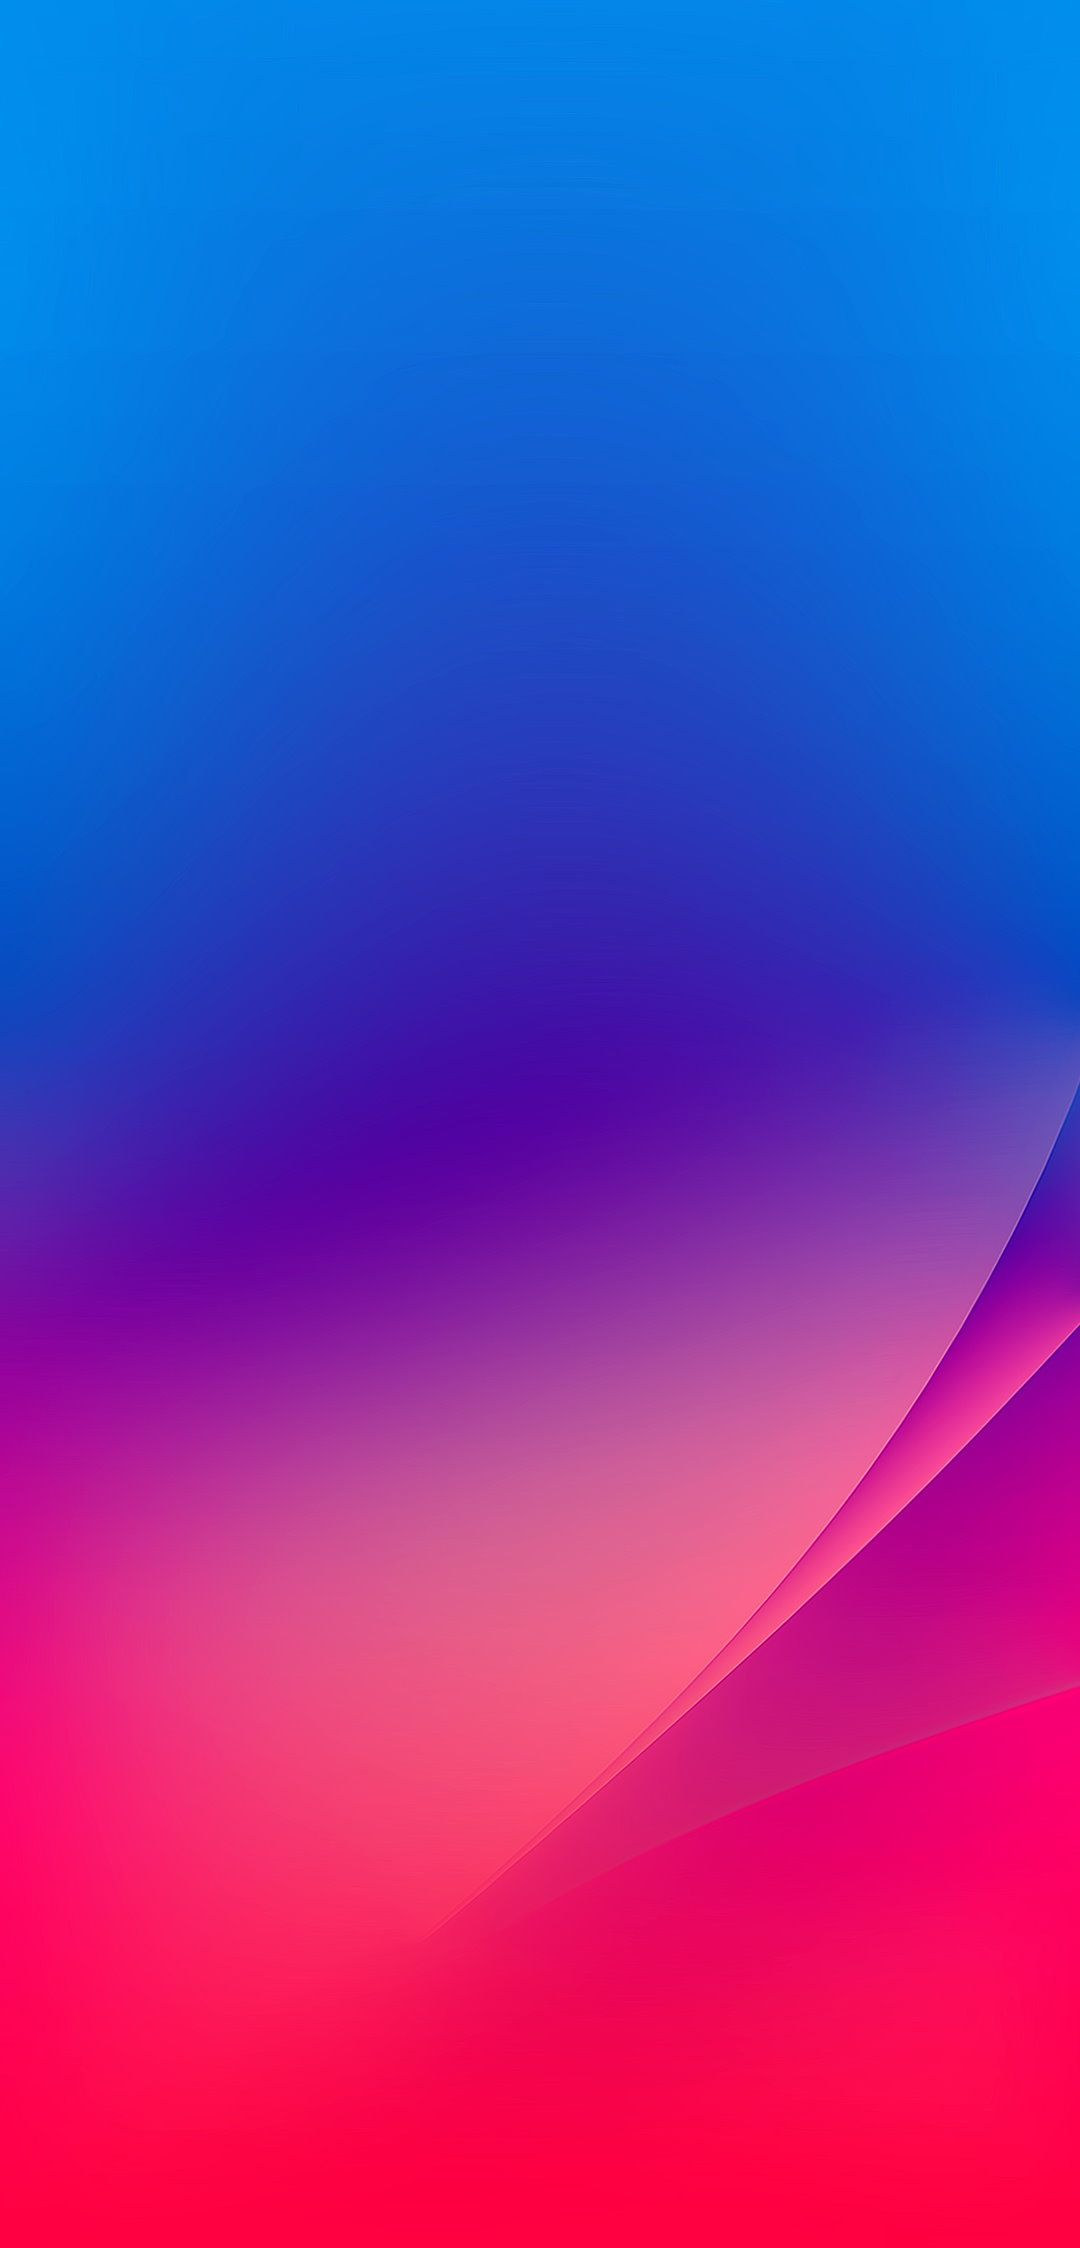 Wallpapers Xiaomi Mi 8 Pack 2 Fond D Ecran Telephone Fond D Ecran Android Fond D Ecran Colore